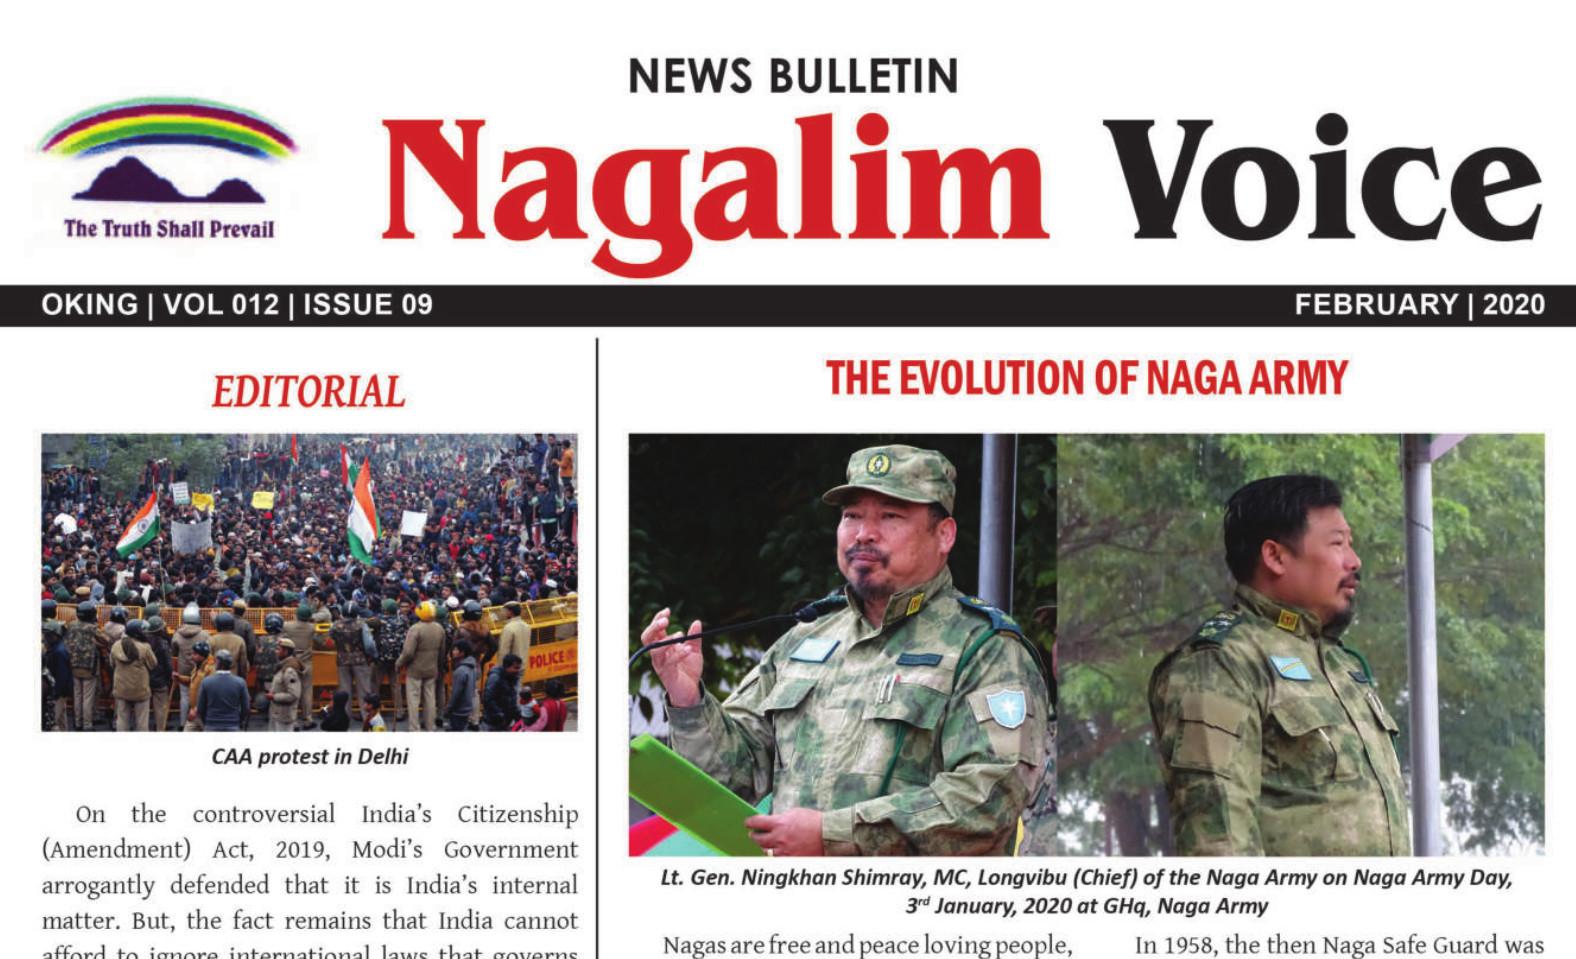 Nagalimvoice February 2020